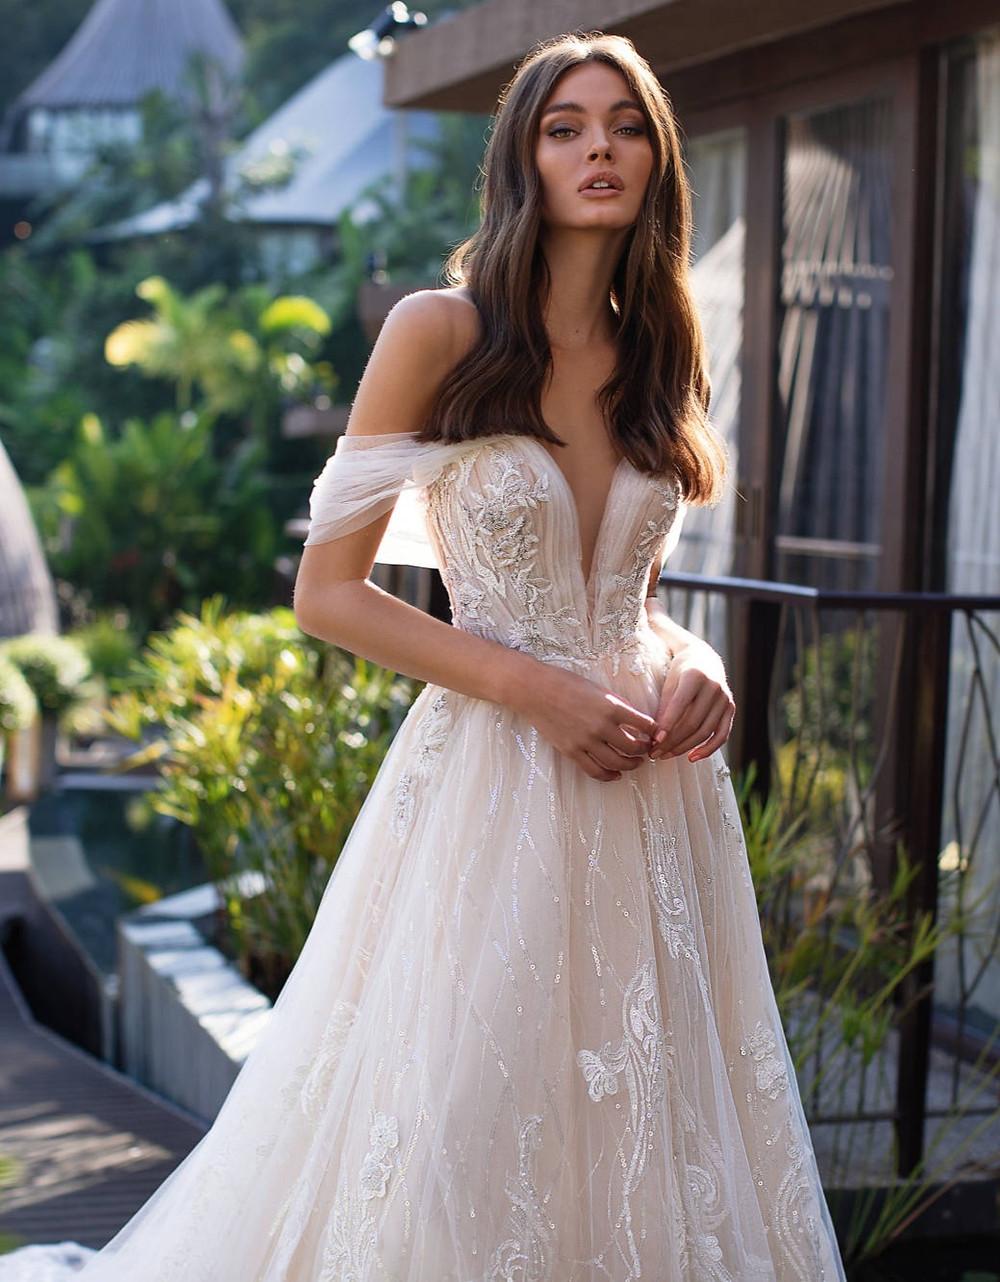 A Milla Nova off the shoulder blush pink princess ball gown wedding dress